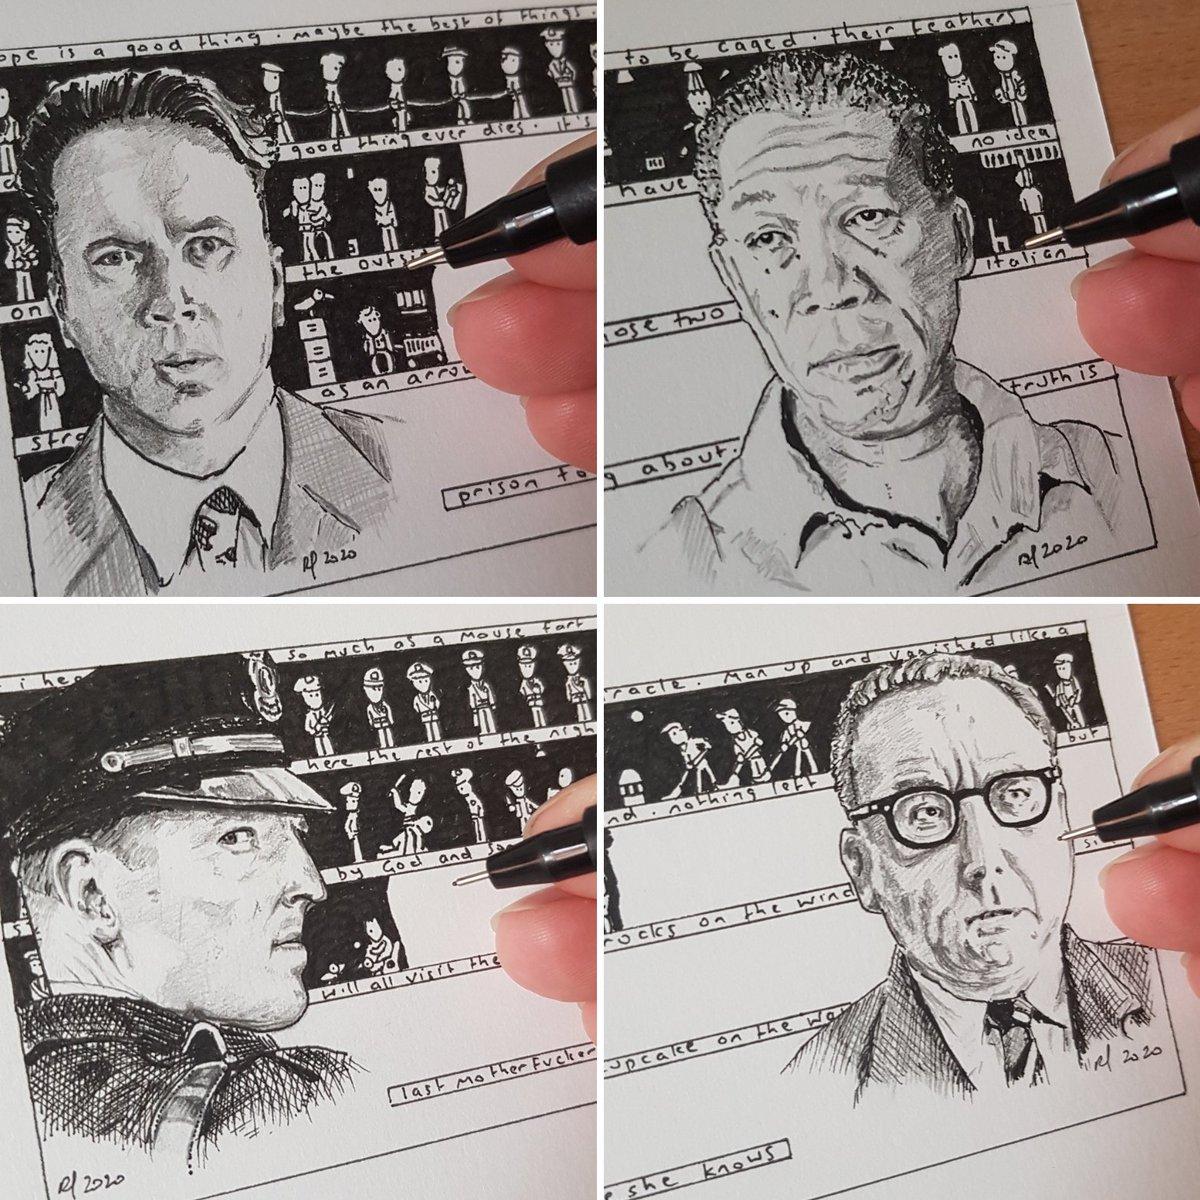 Drawing #theshawshankredemption #shawshank #shawshankredemption #andydufresne #clancybrown #bobgunton #morganfreeman #inktoberpic.twitter.com/WK0x3QbrkU